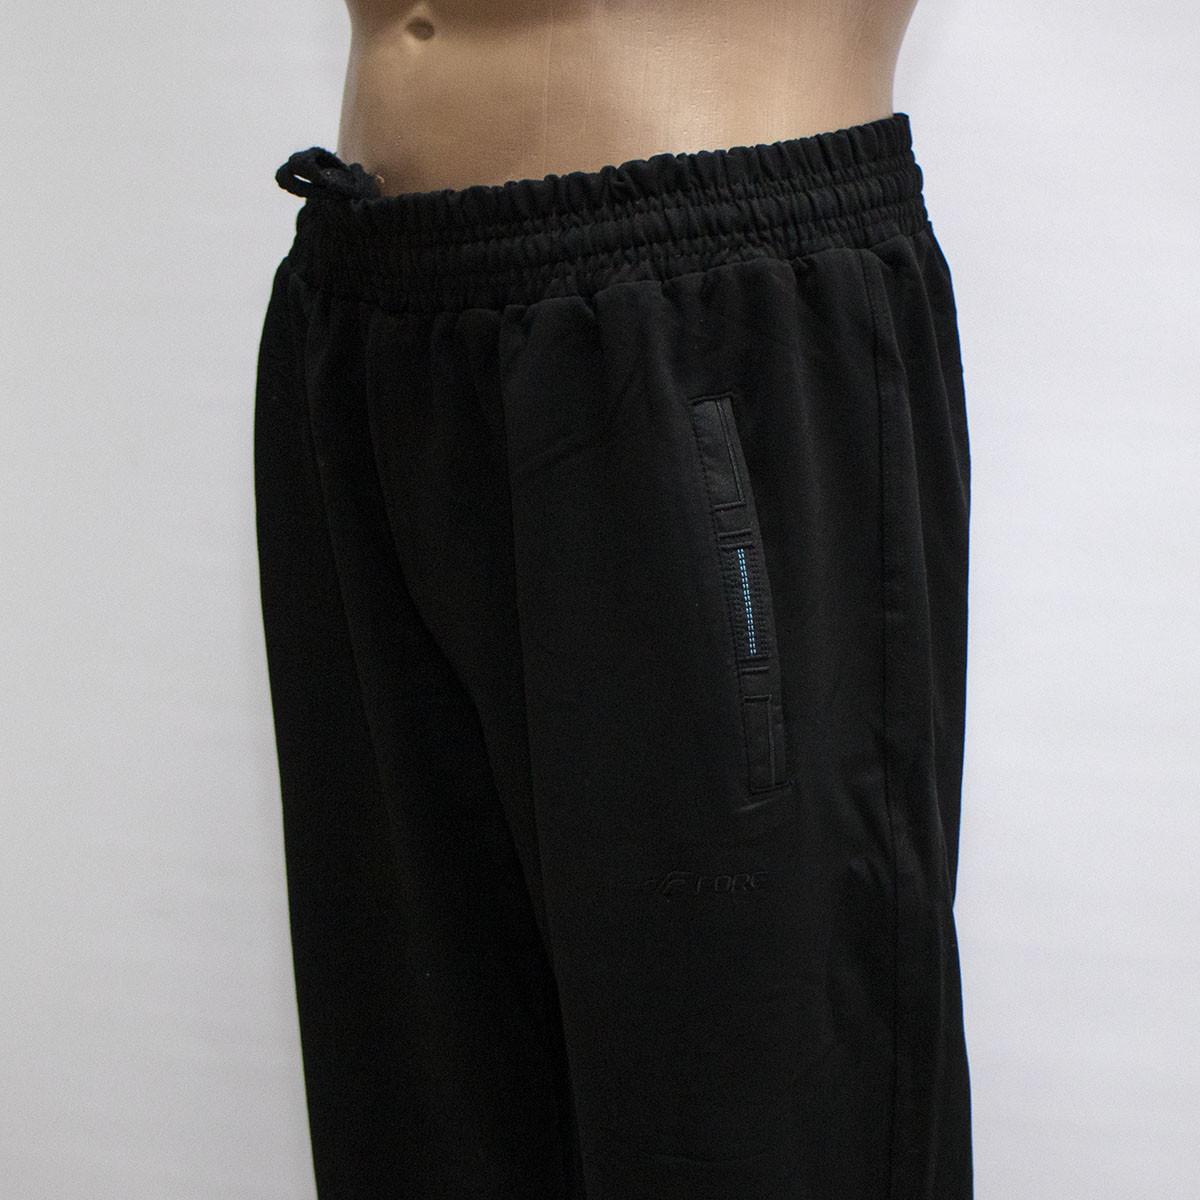 Мужские спортивные штаны большого размера Баталы тм. FORE 9532G